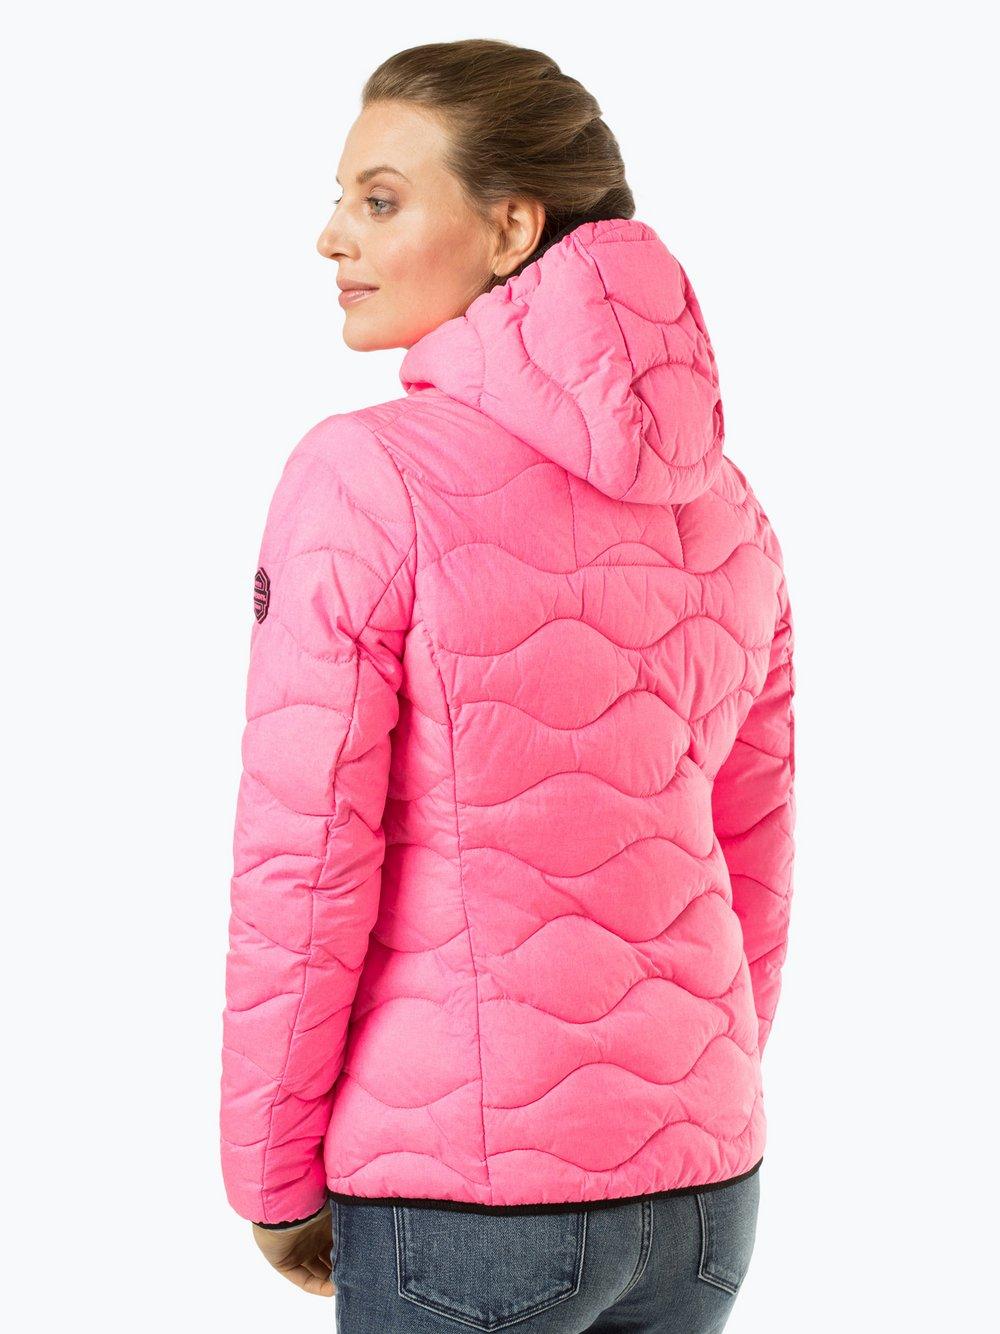 online retailer c2f78 4bfb6 Superdry Damen Steppjacke online kaufen | VANGRAAF.COM